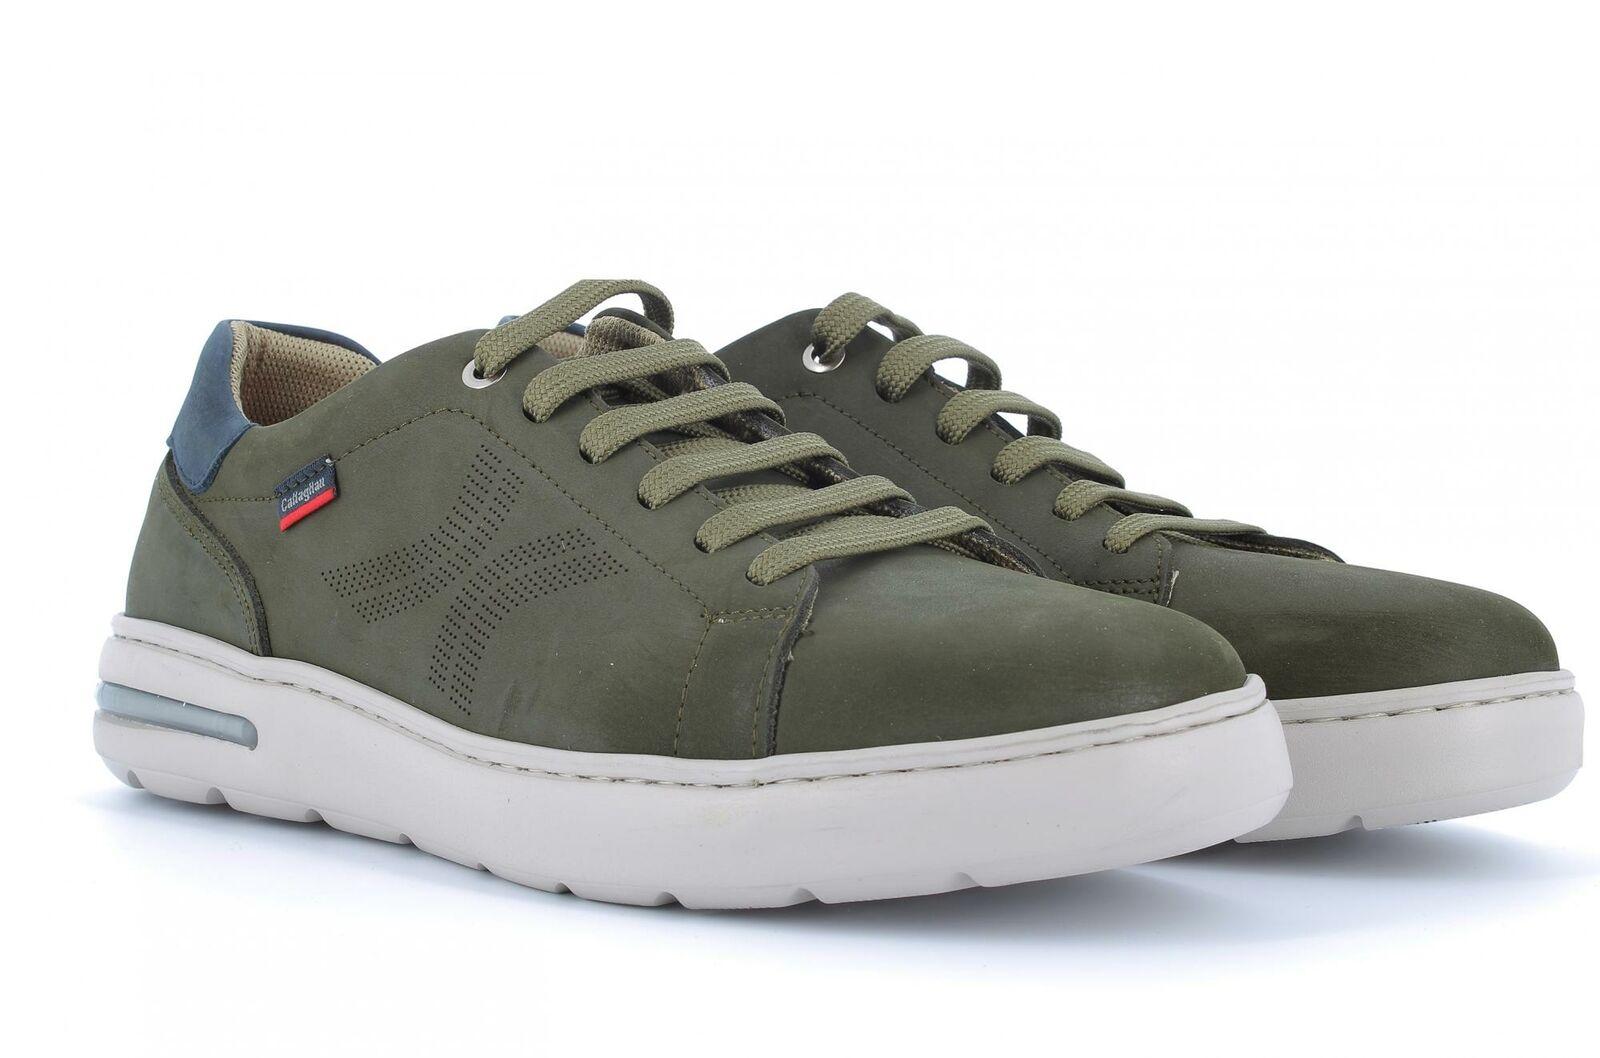 Callaghan P19s chaussures de hombre Pantoufles bajas 14100 vert